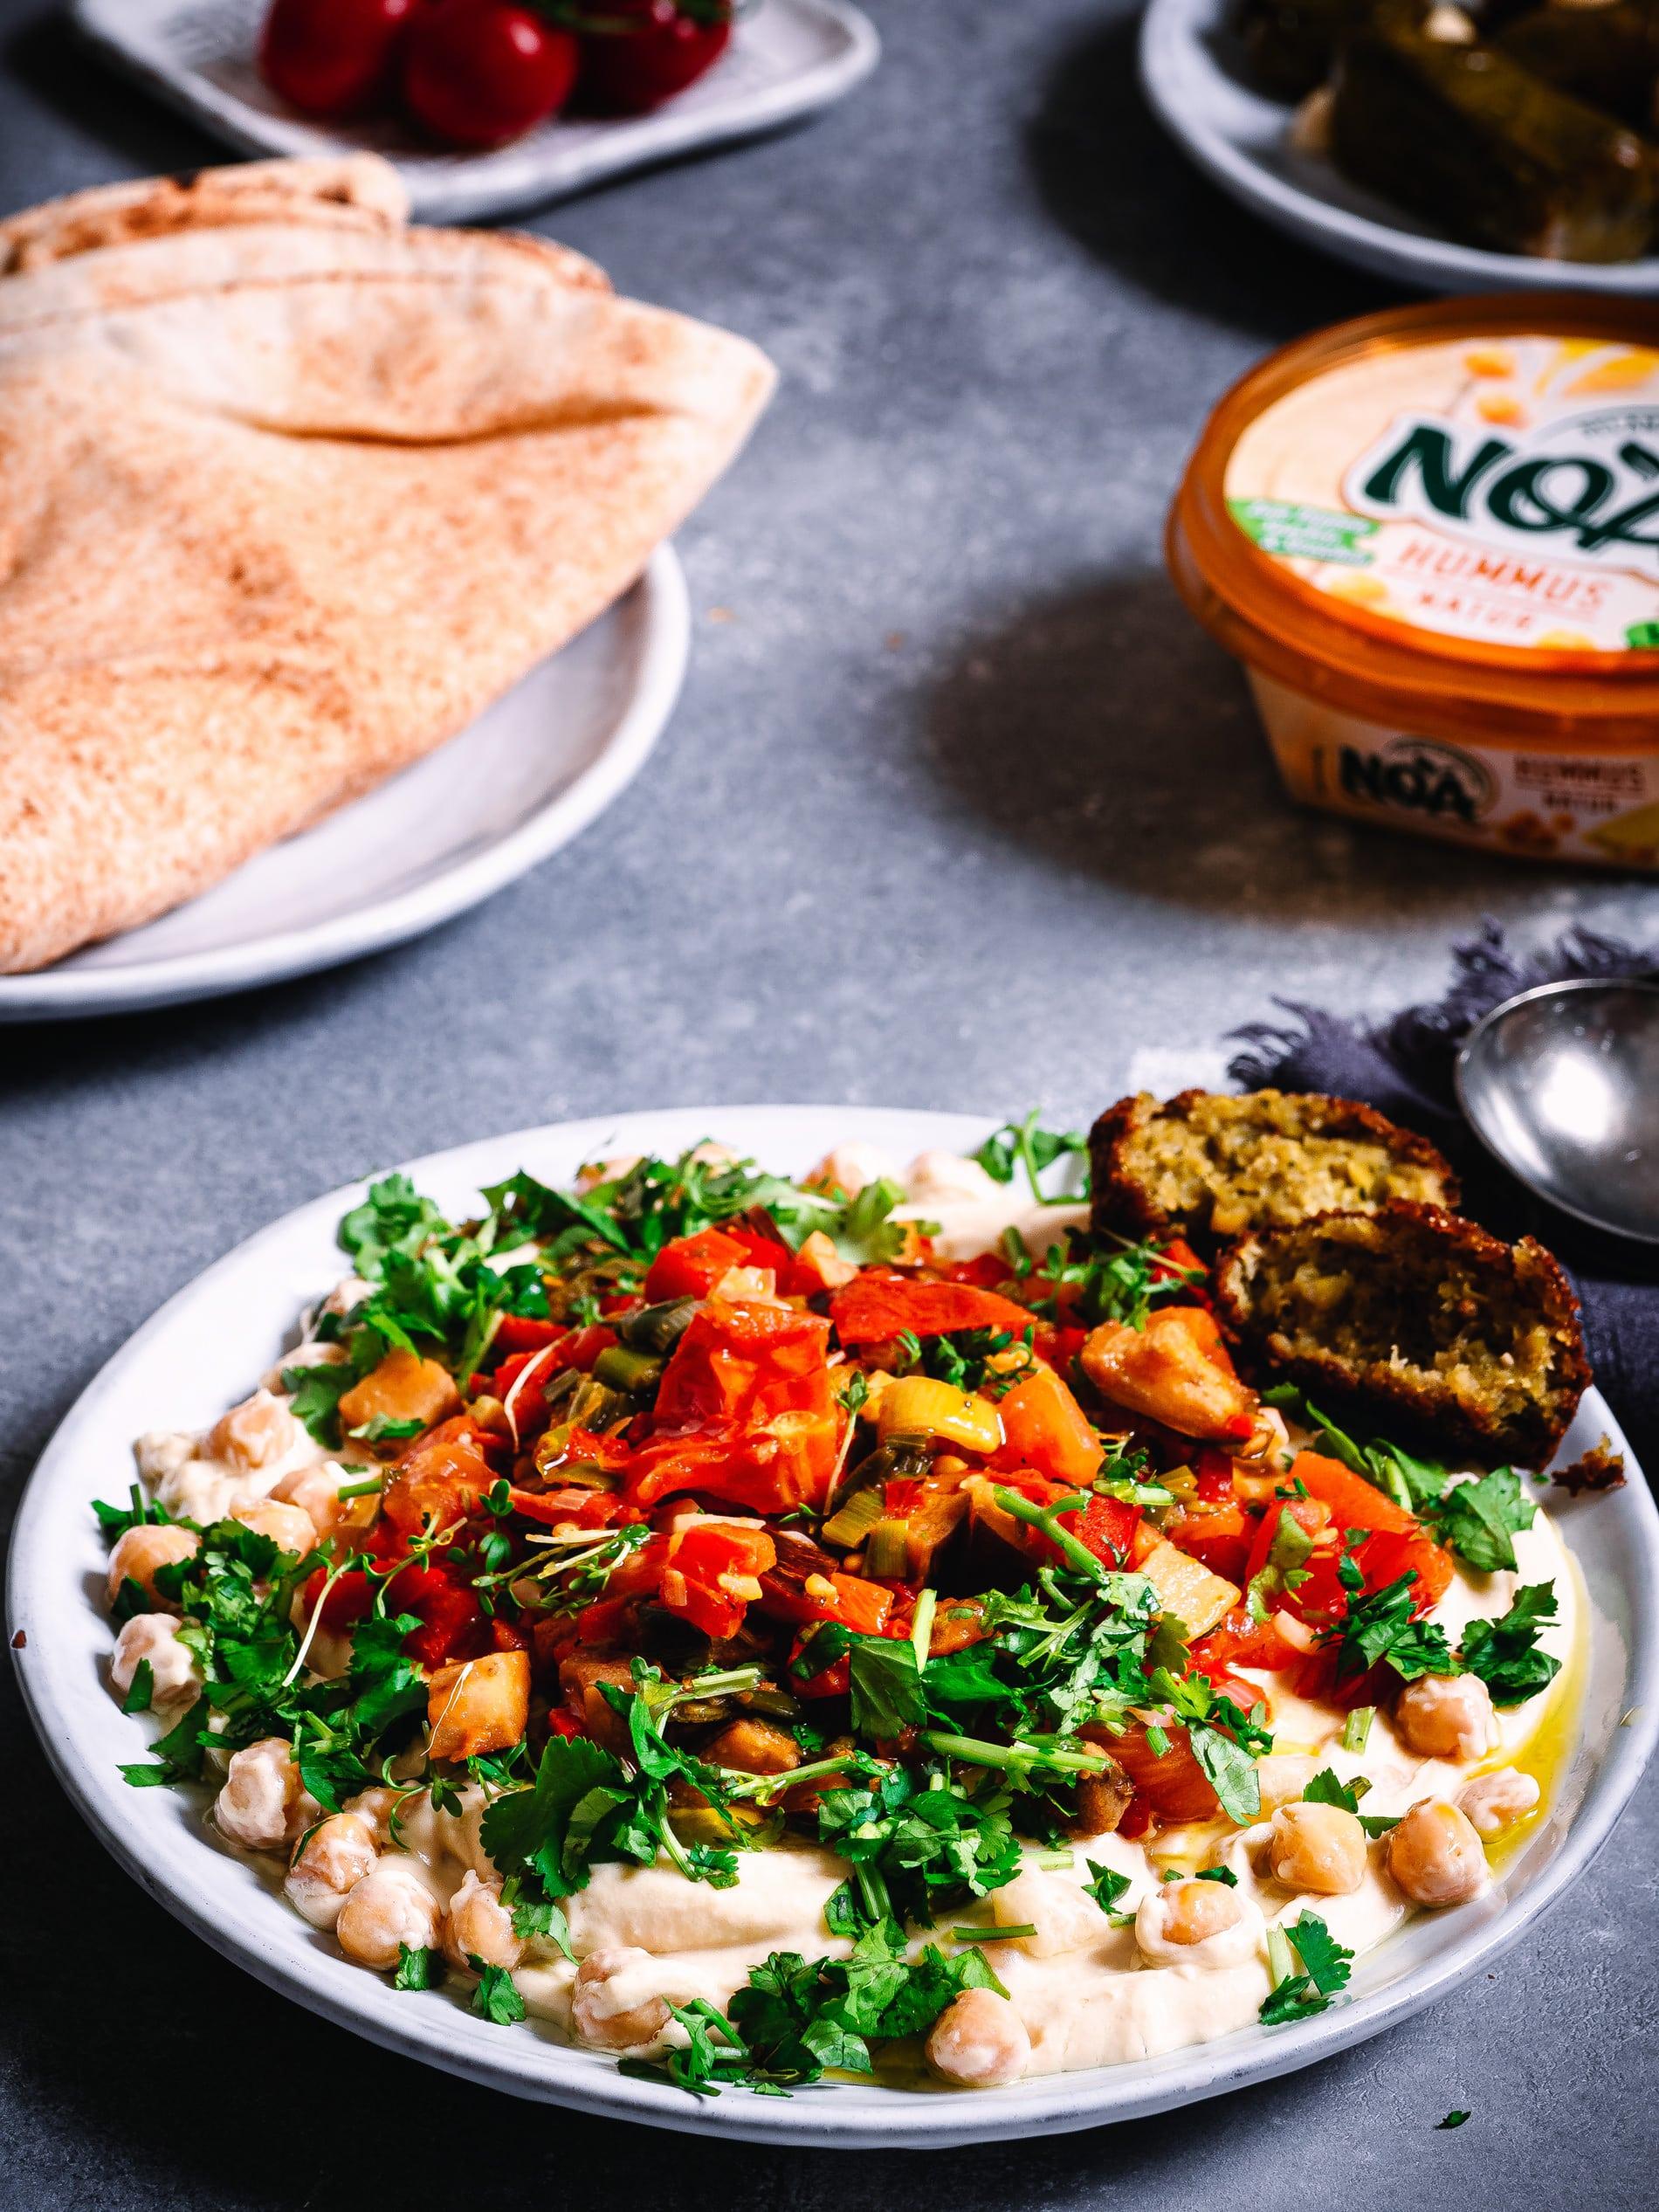 Teller mit veganem Shakshuka und Hummus